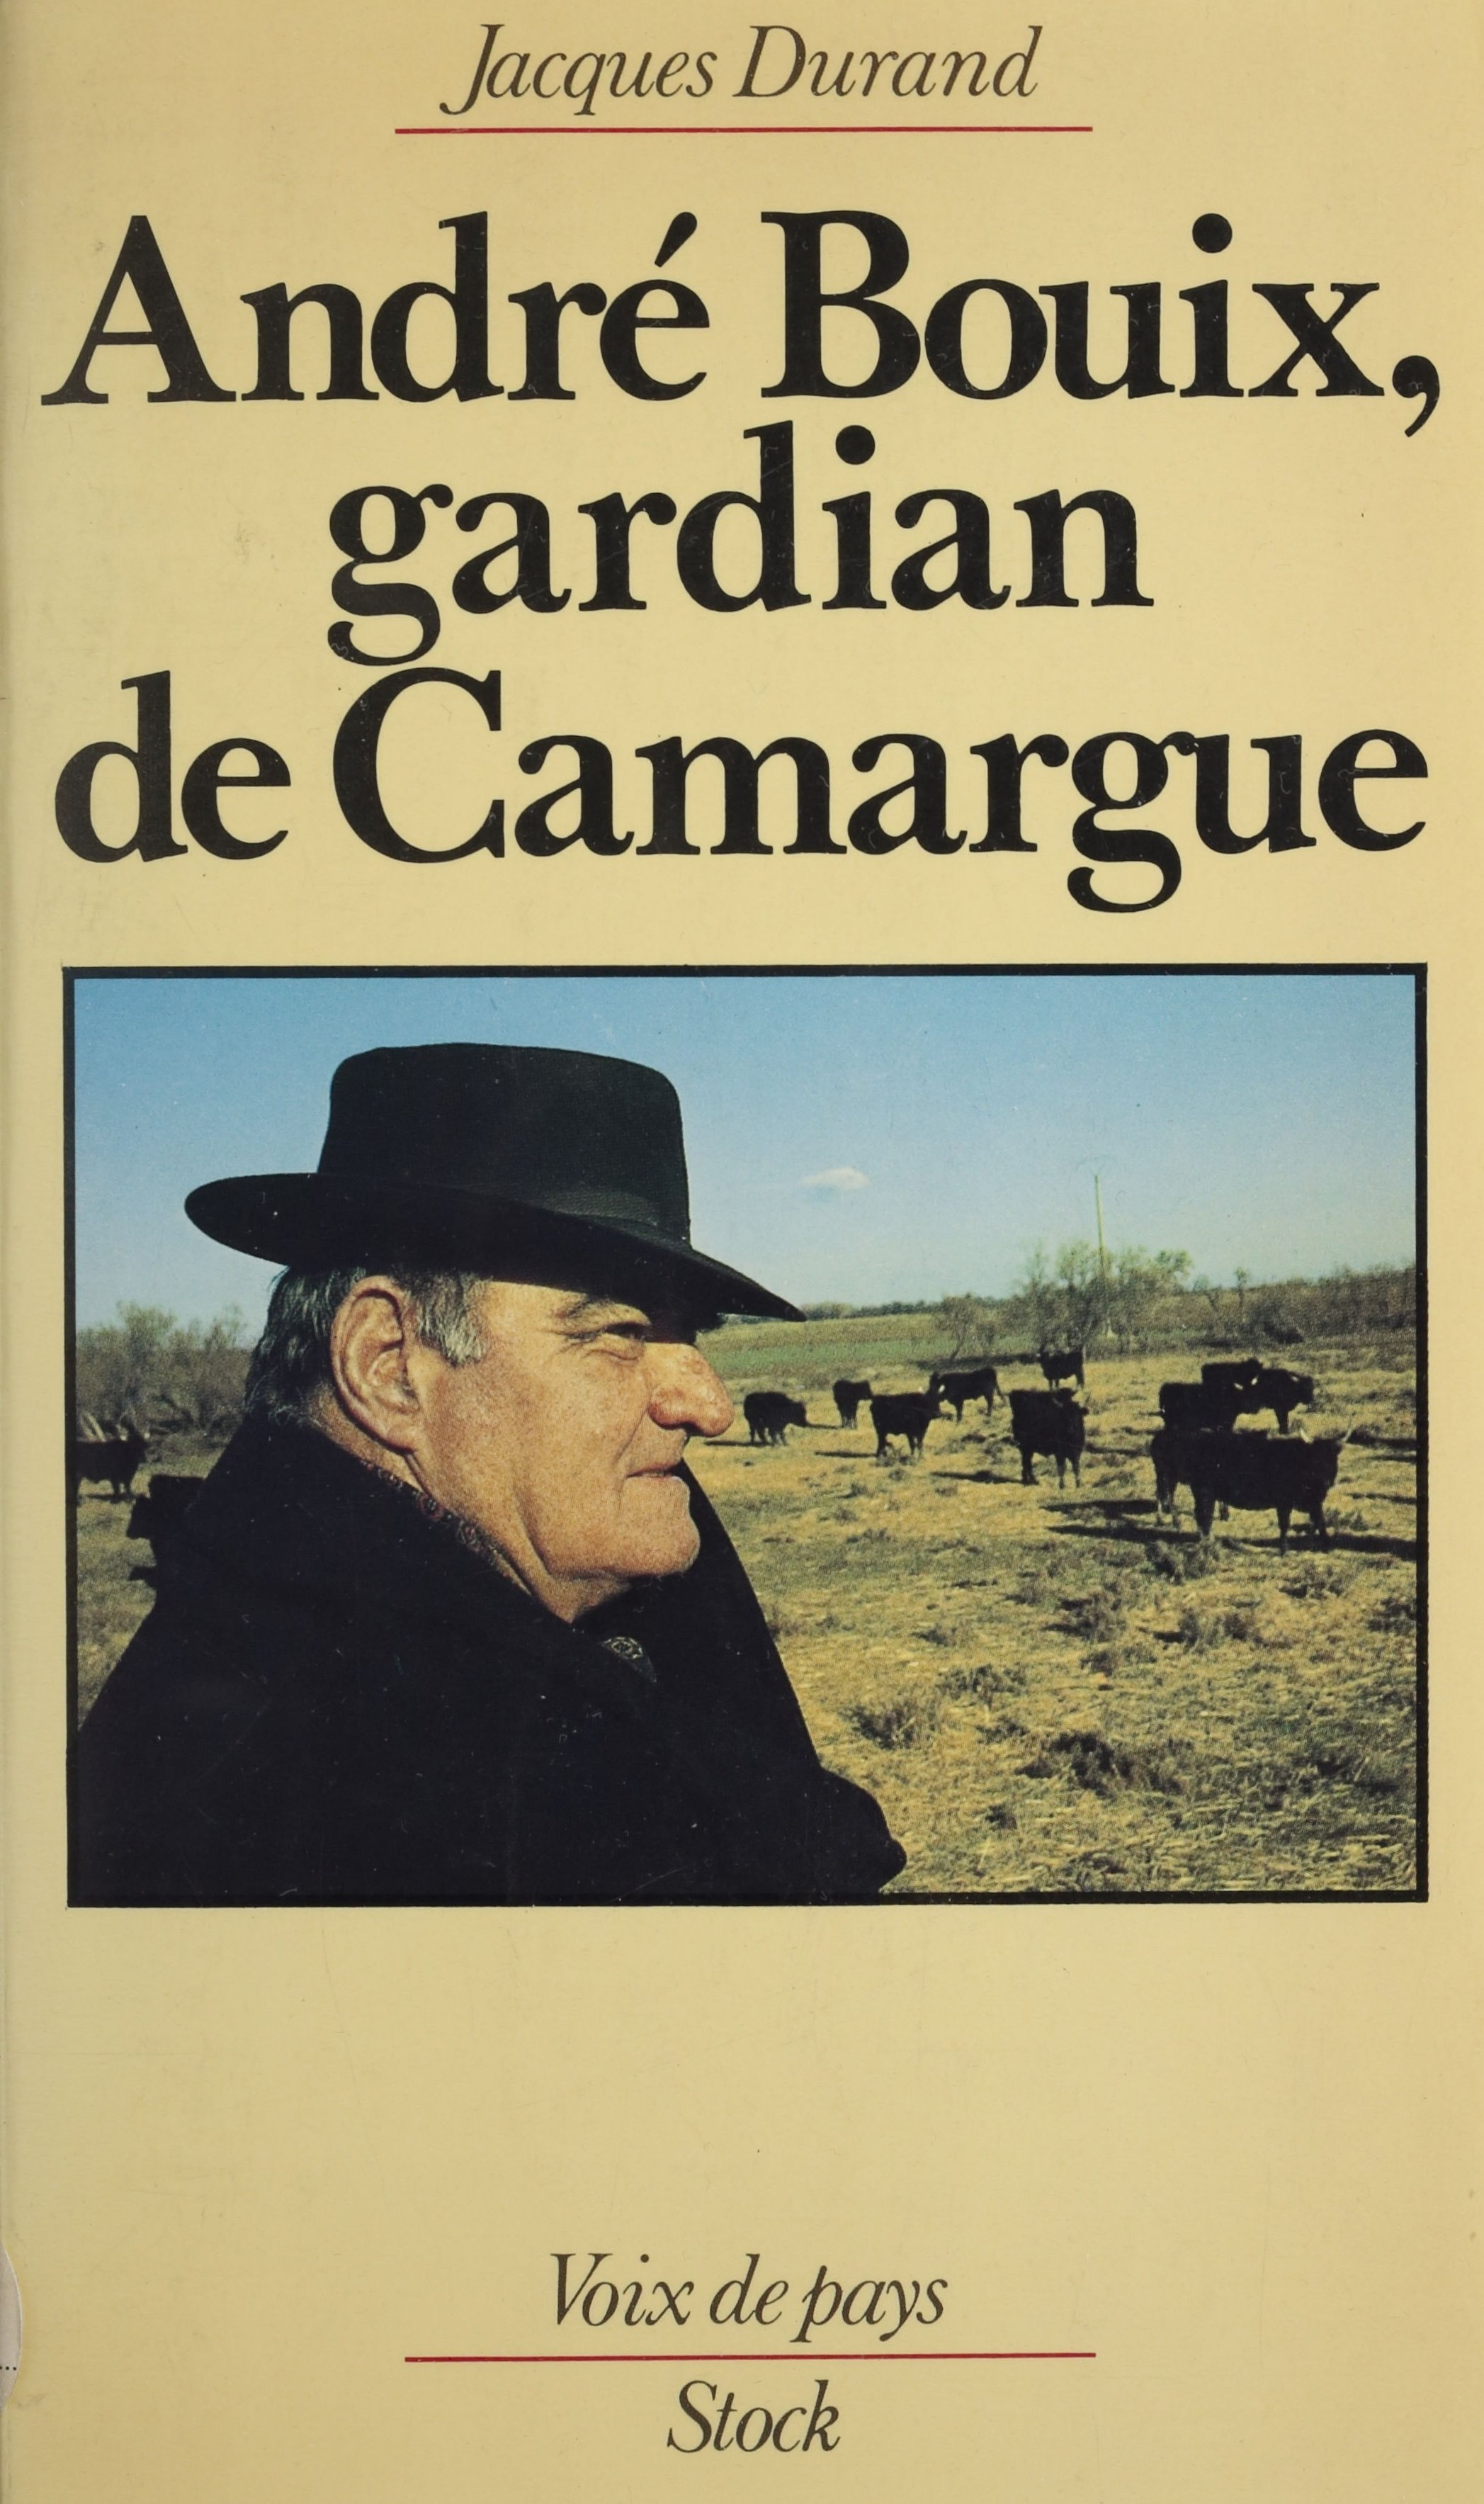 André Bouix : gardian de Camargue